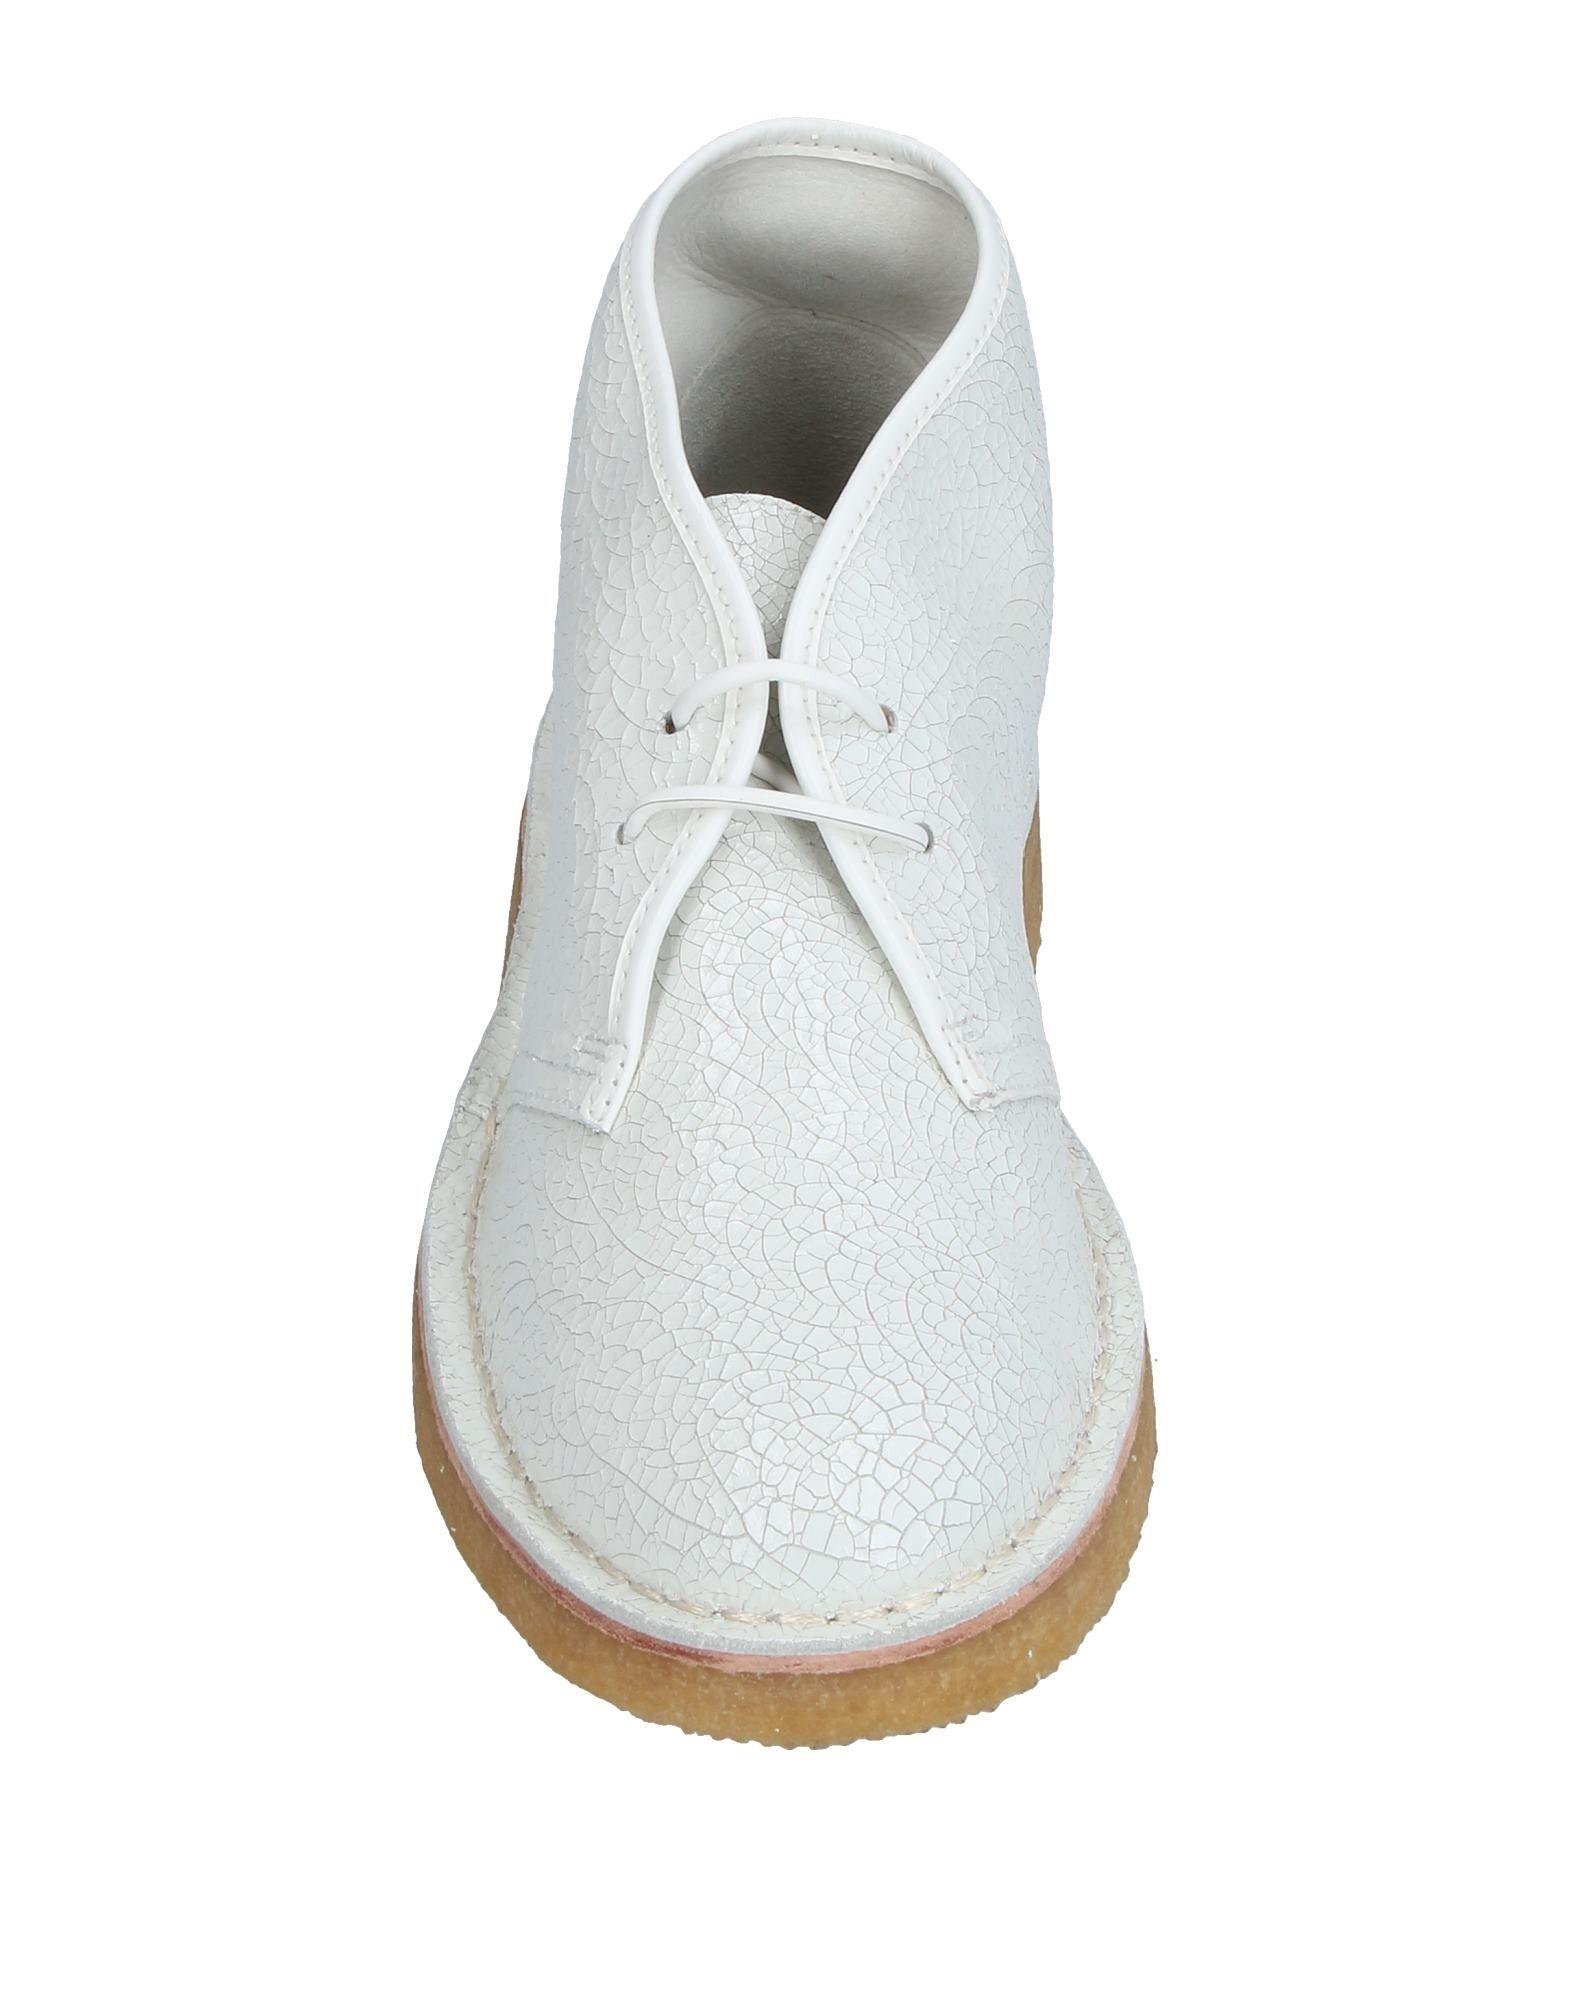 Stilvolle billige Schuhe Tory Burch Stiefelette Damen  11203661PV